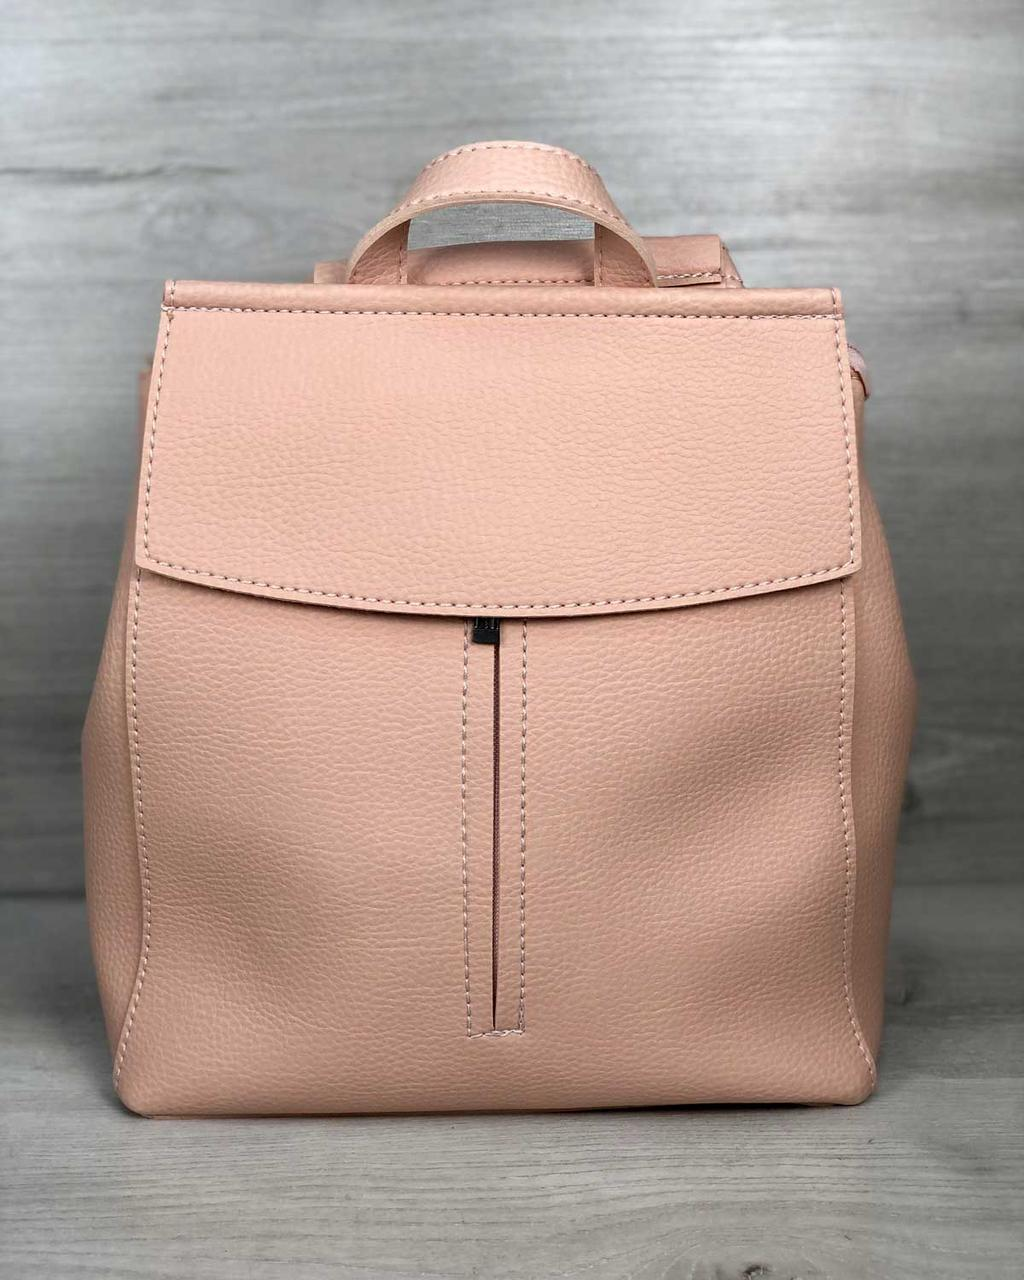 Женский сумка-рюкзак Фаби пудрового цвета